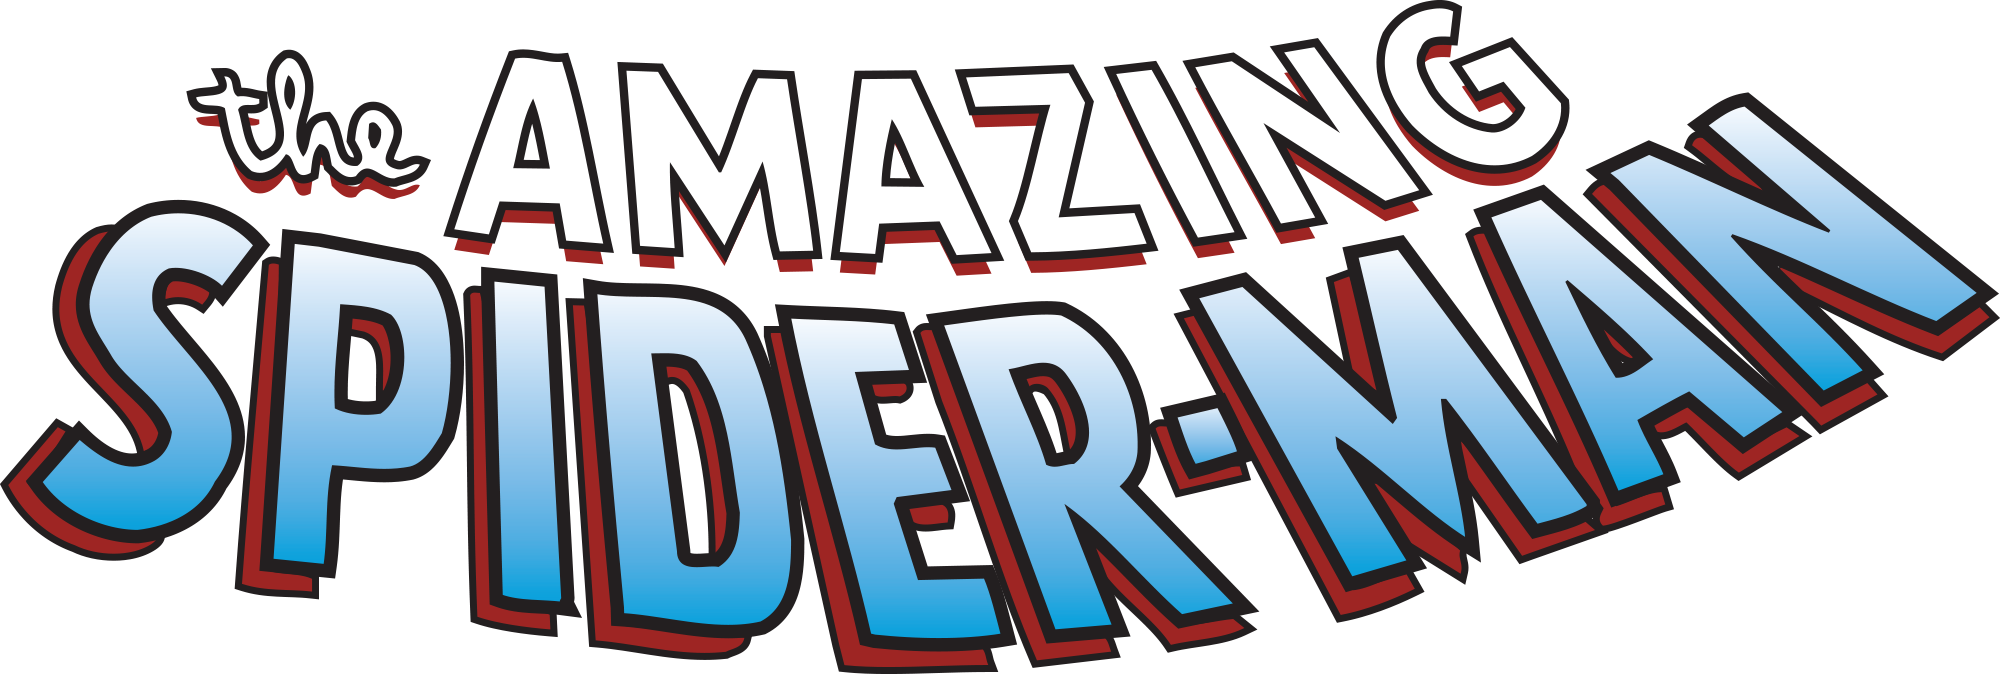 Amazing Spider-Man Logo